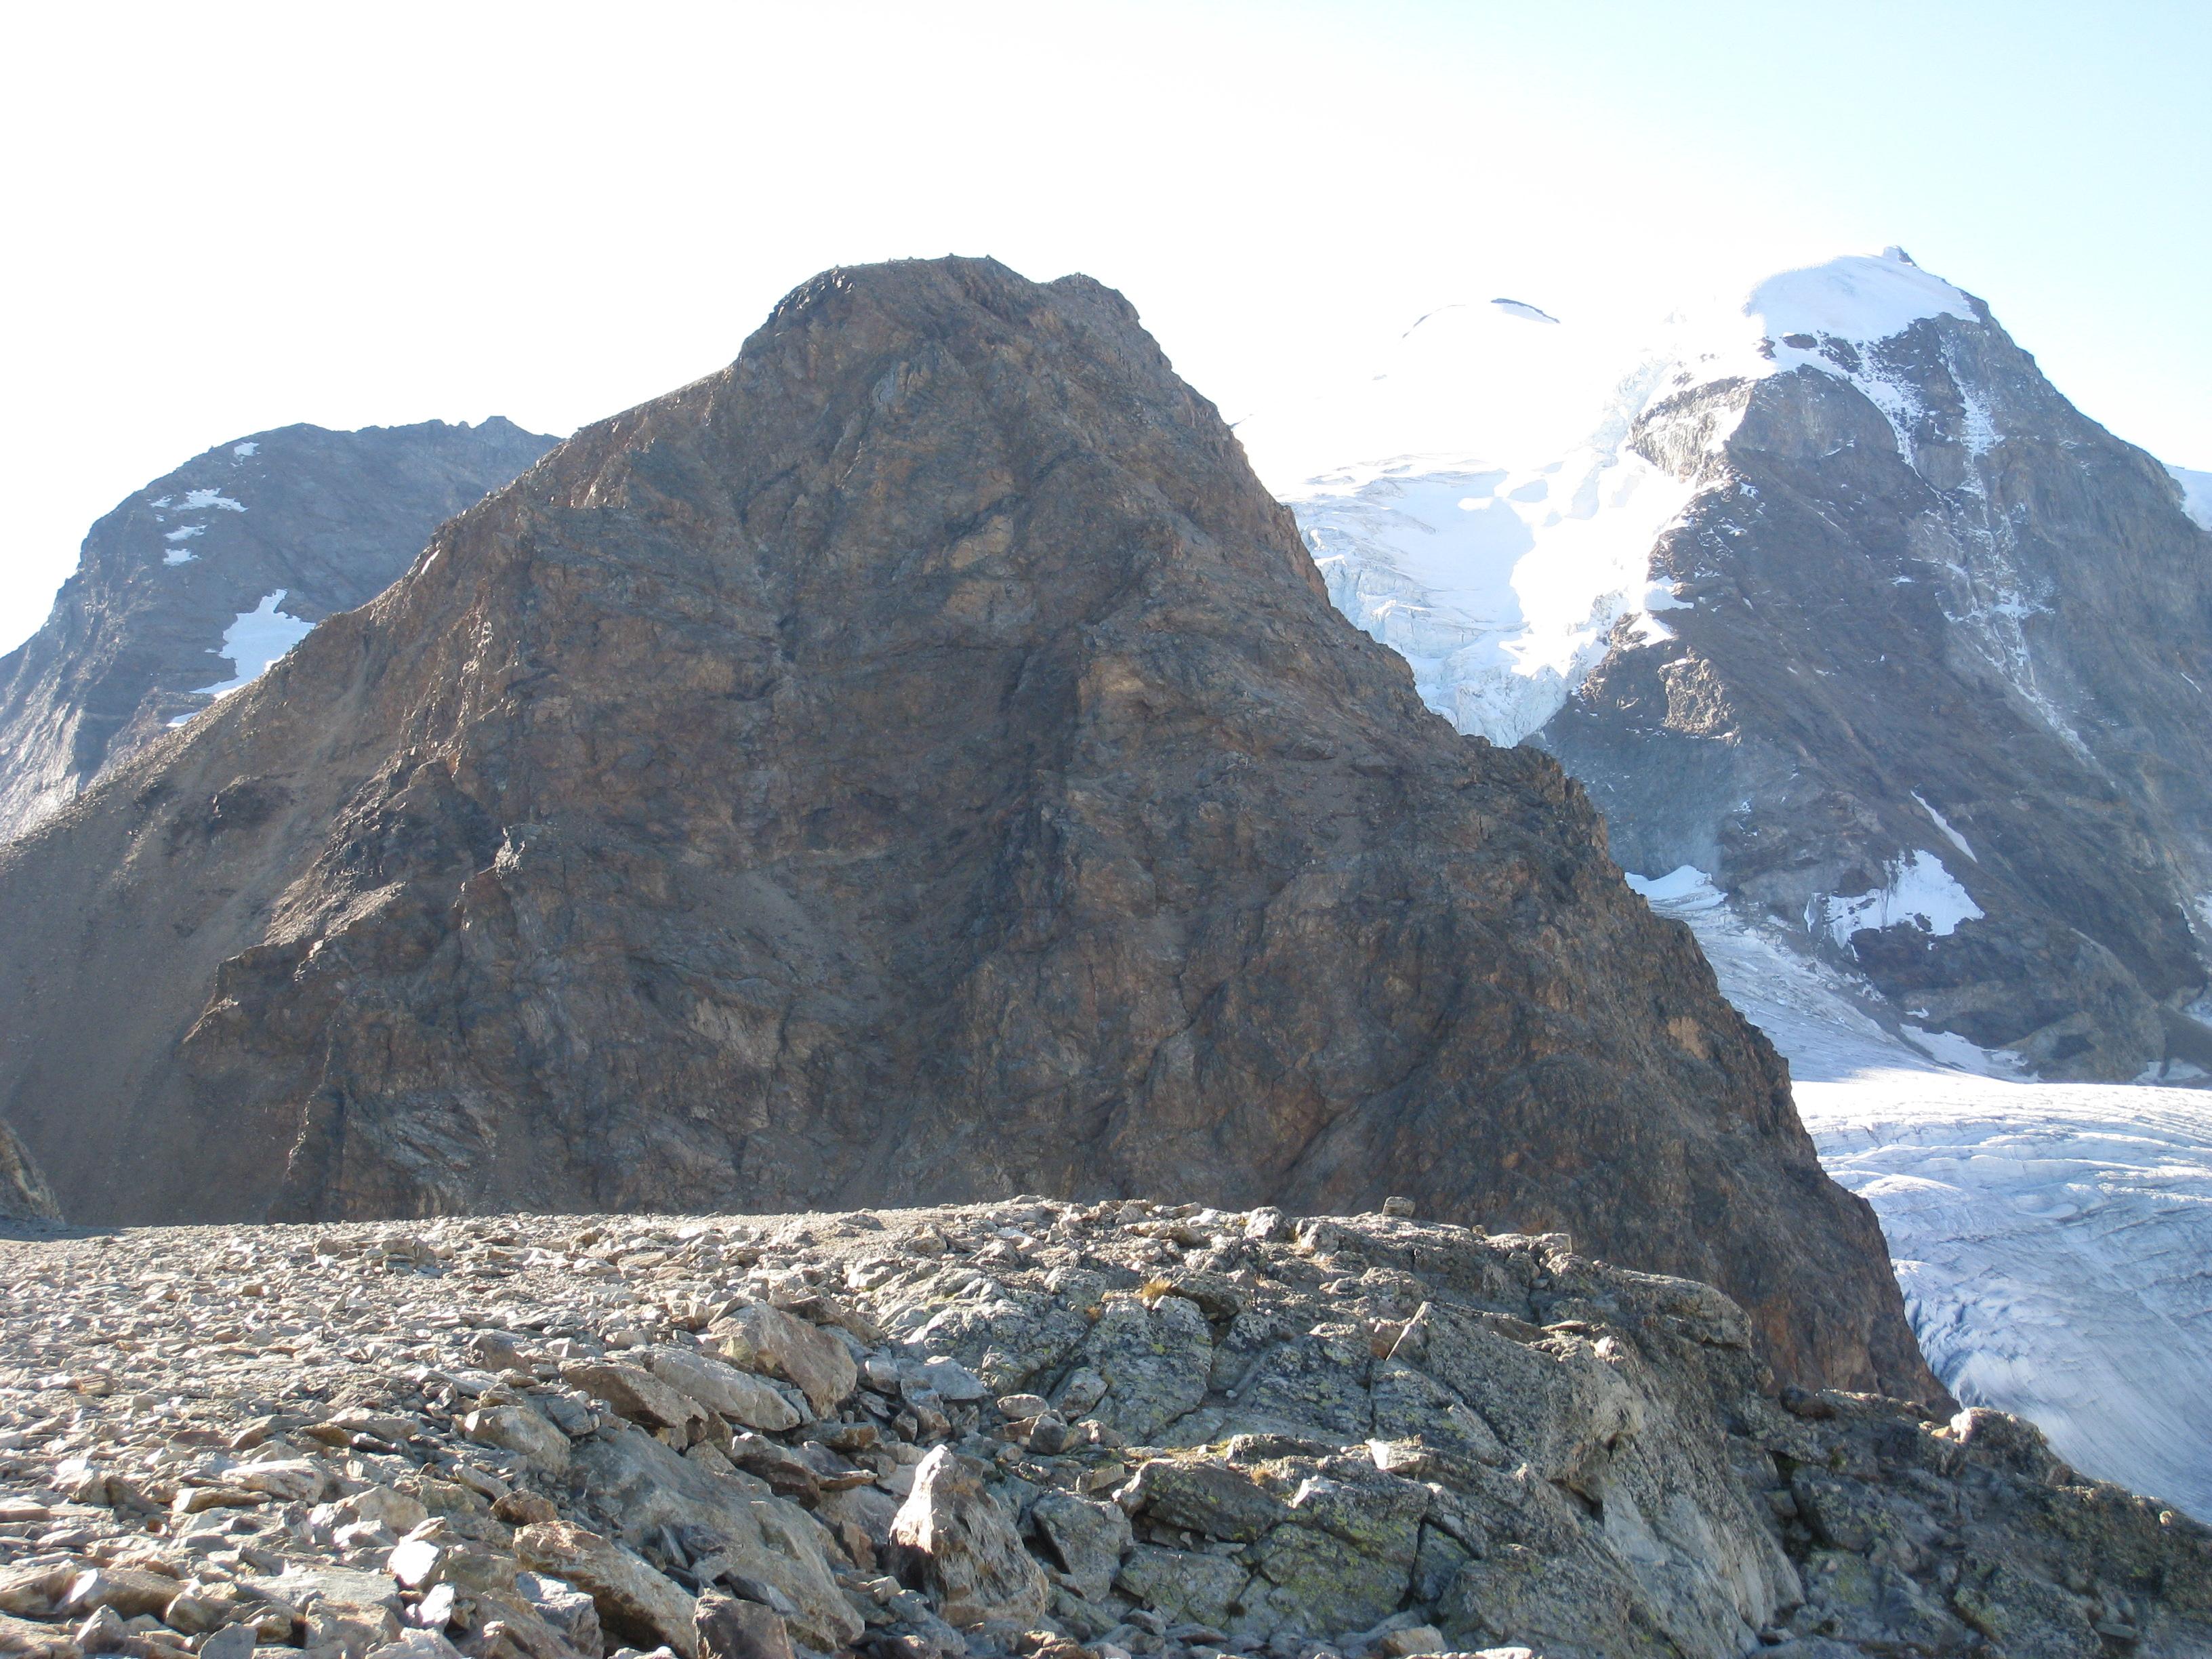 Klettersteig Piz Trovat : Klettersteig piz trovat fipo